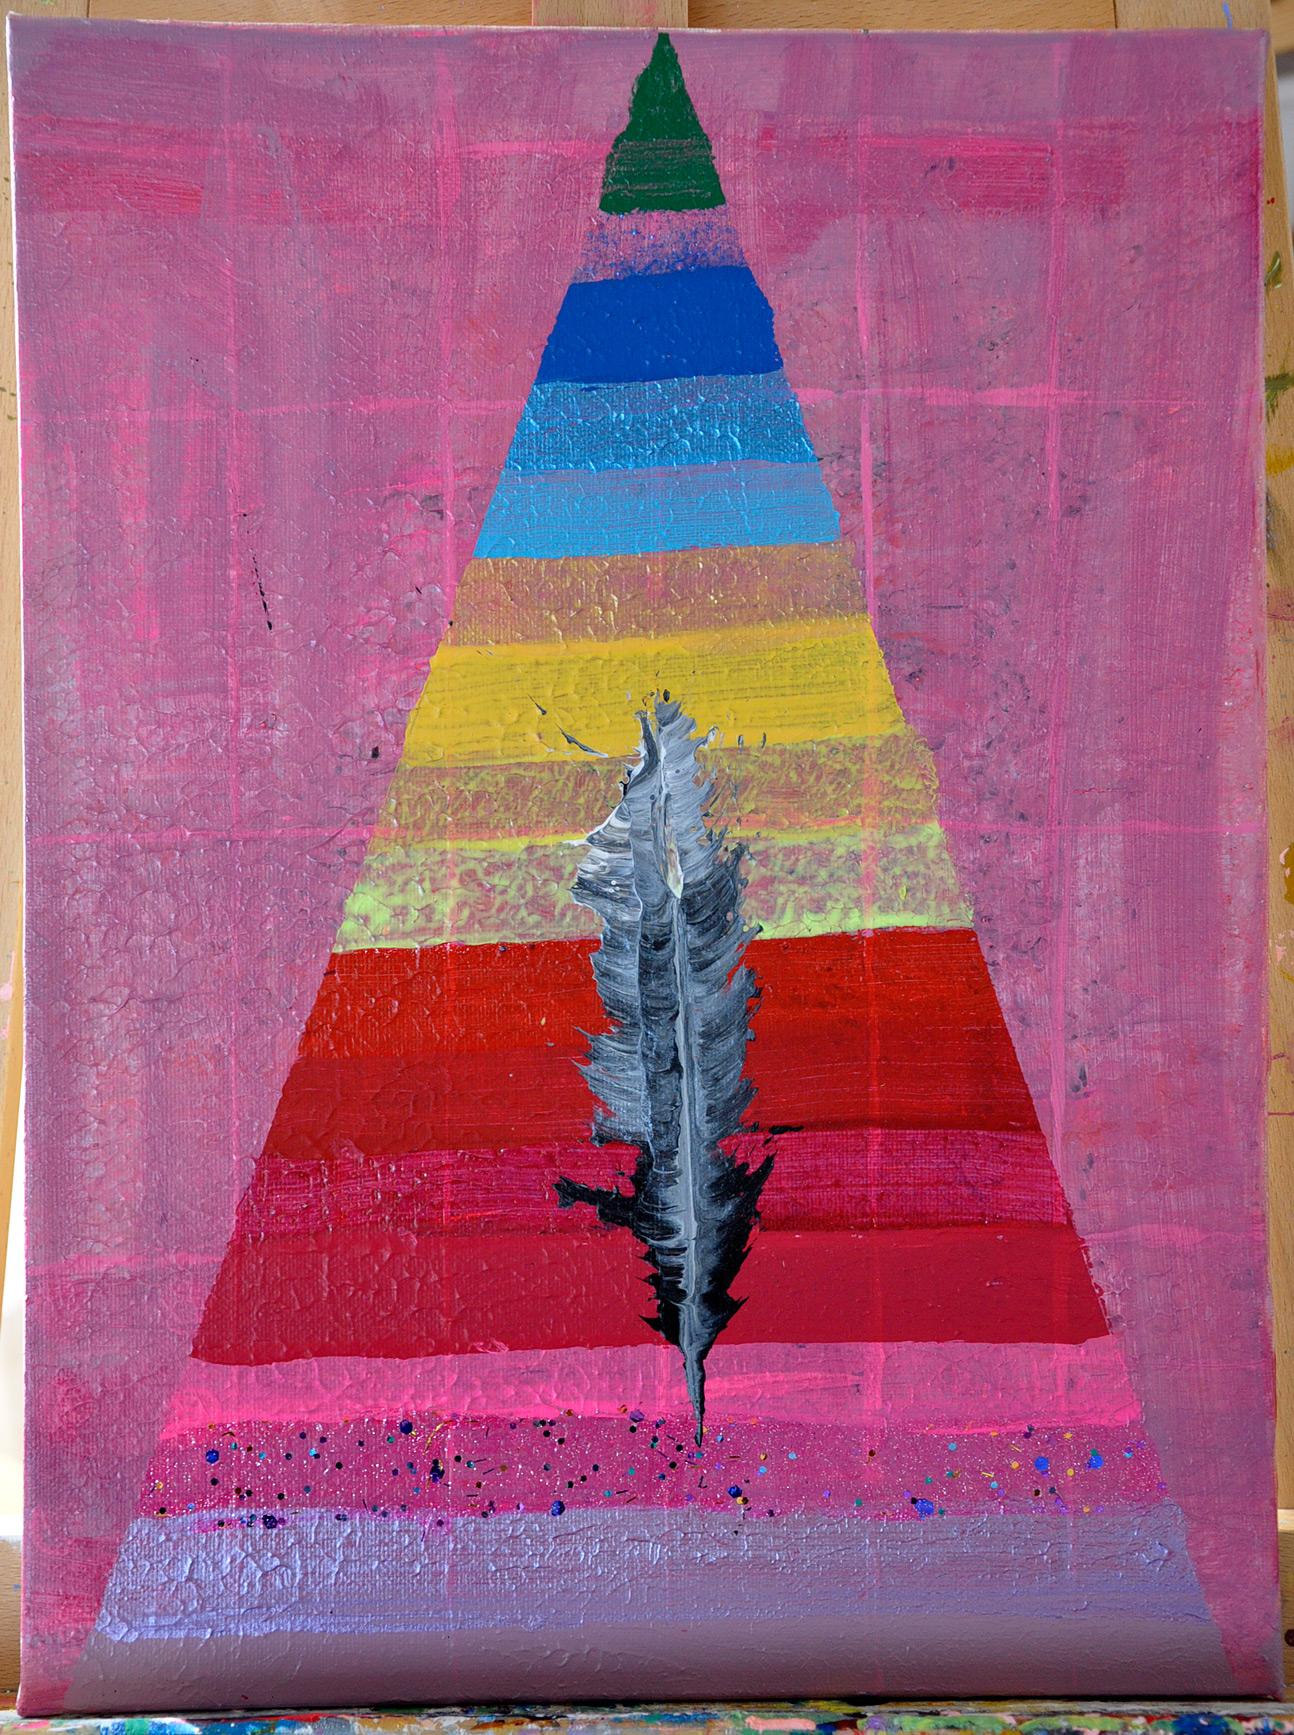 Pyramide der Feder